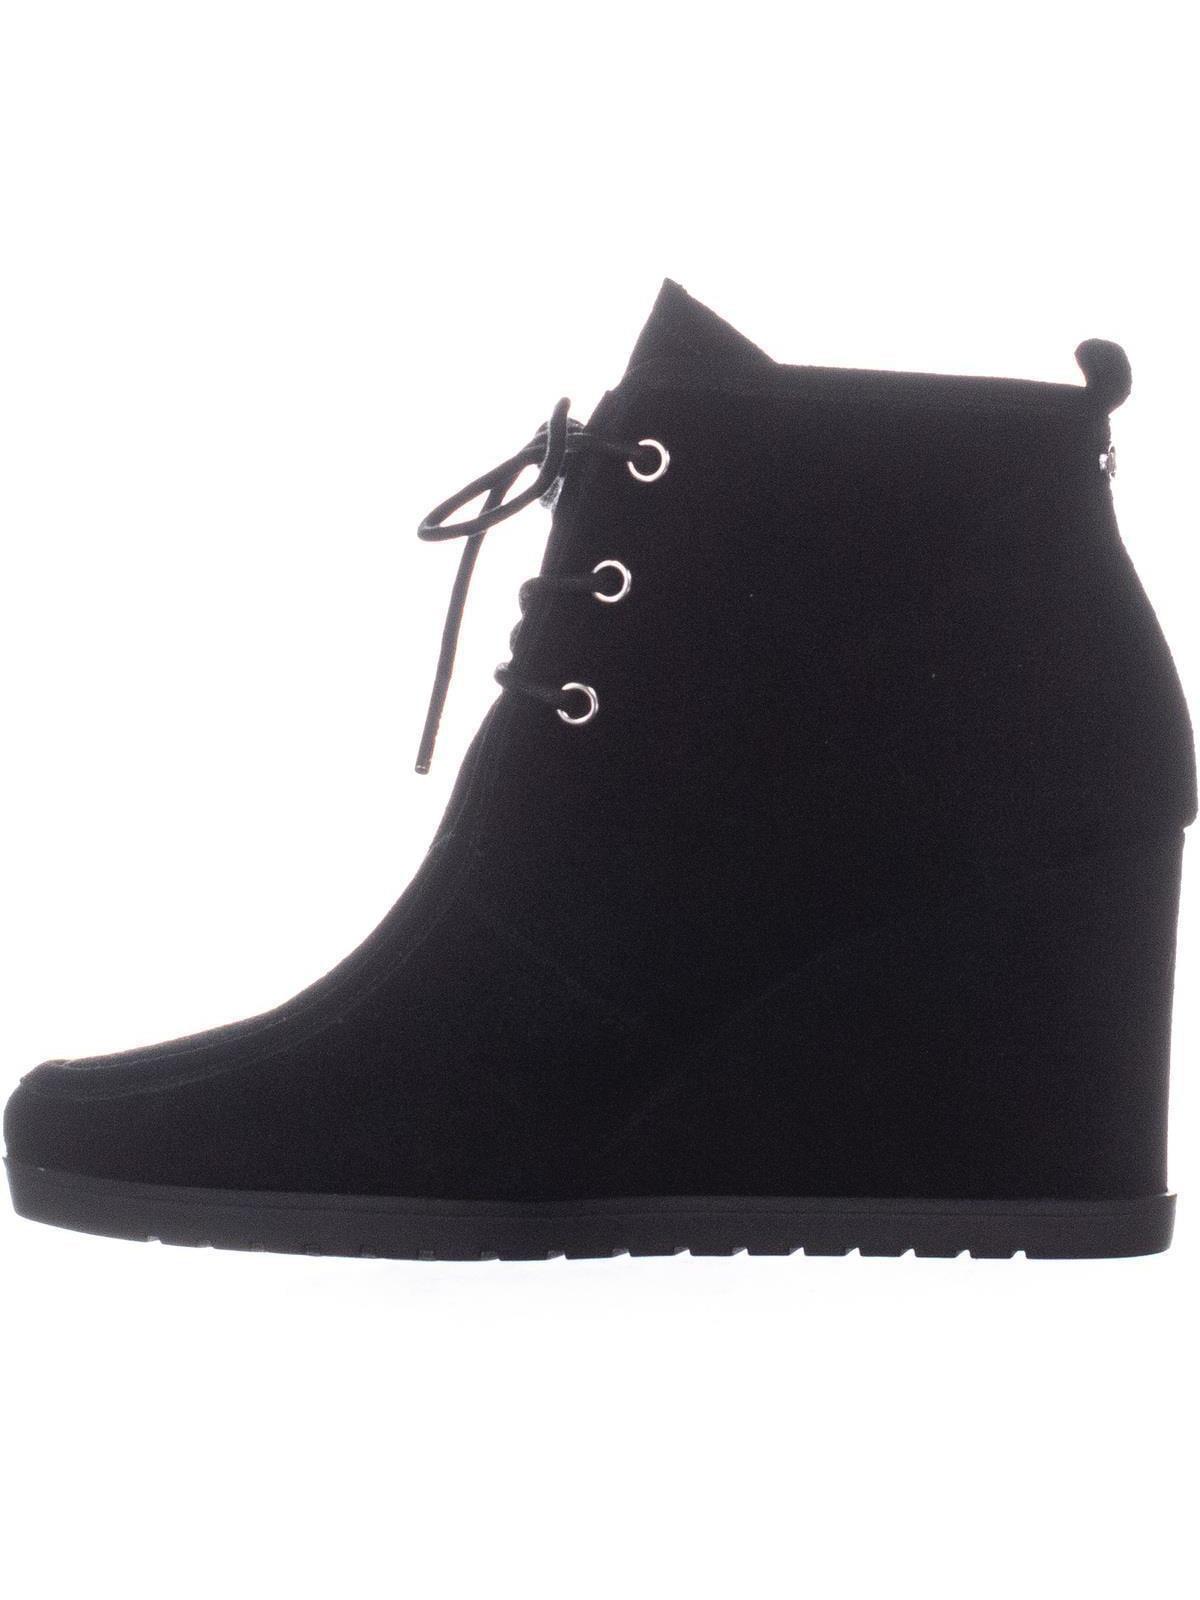 fbfce0f67474 Michael Kors - Womens MICHAEL Michael Kors Tamara Lace Up Bootie Wedge Boots